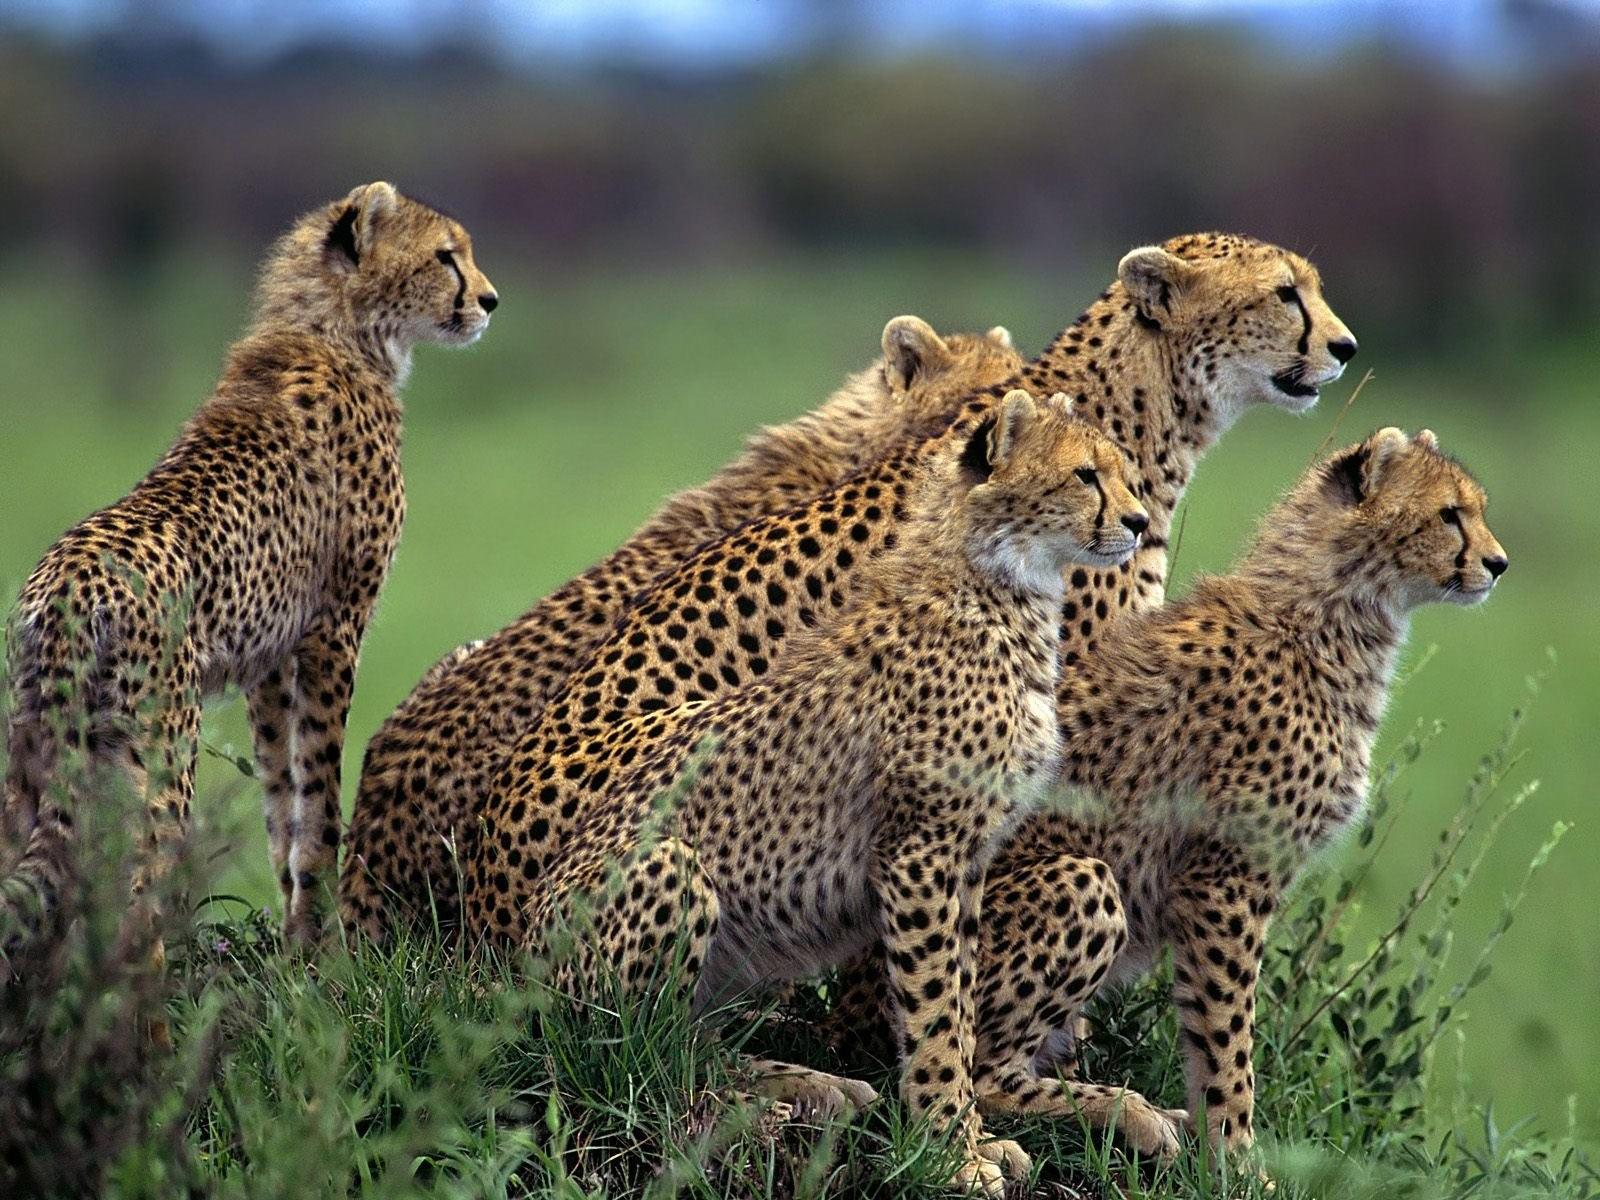 affectionate cheetahs wallpapers - Affectionate Cheetahs Wallpaper HD Wallpapers Storm